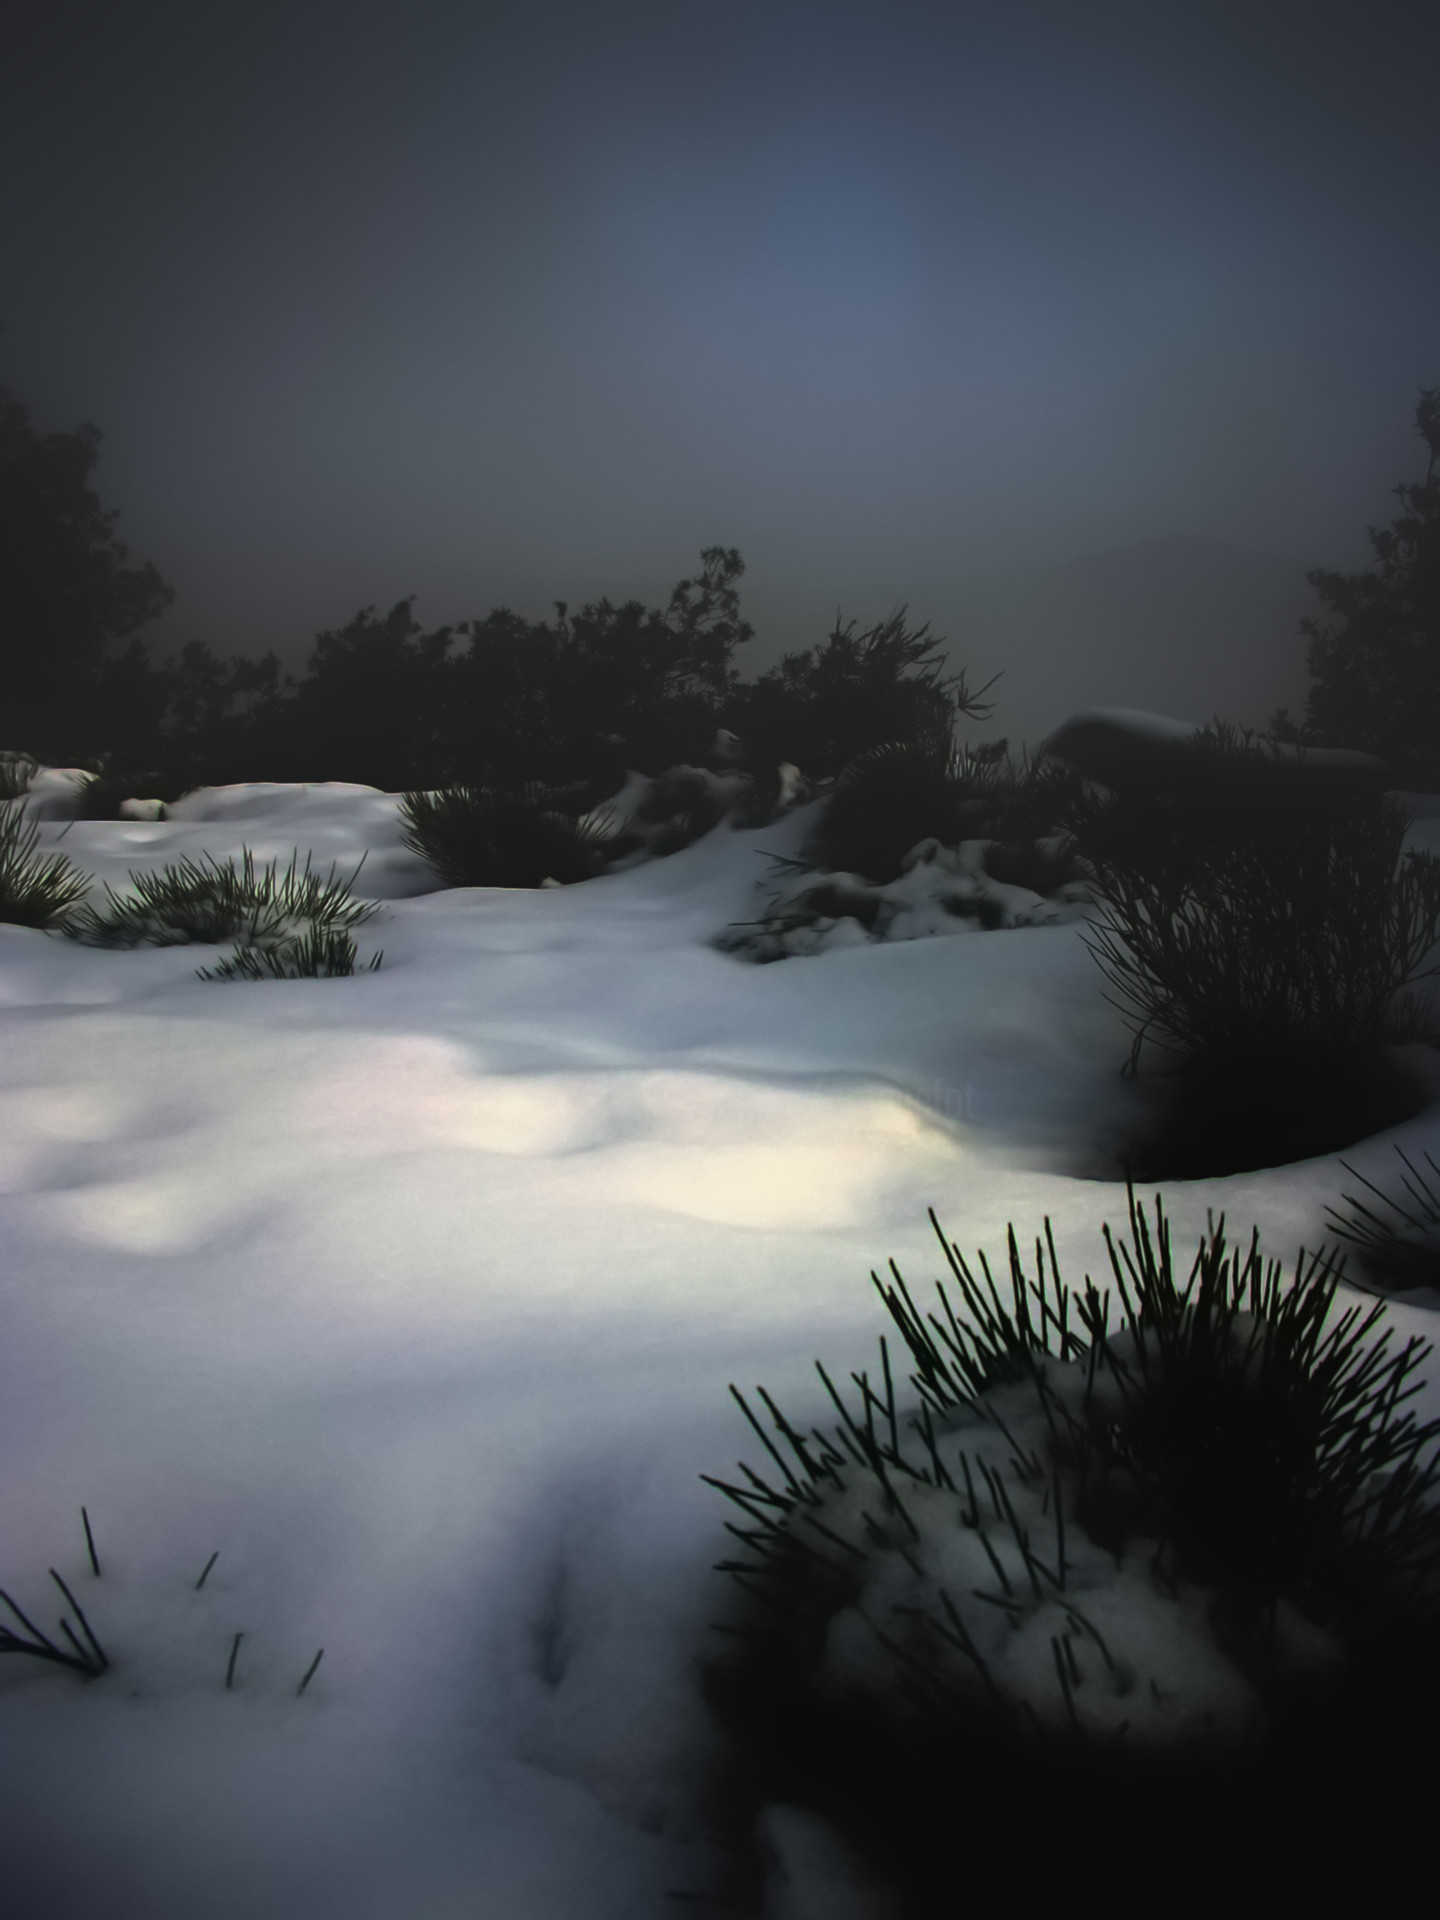 Alain Brasseur - Clair-obscur hivernal